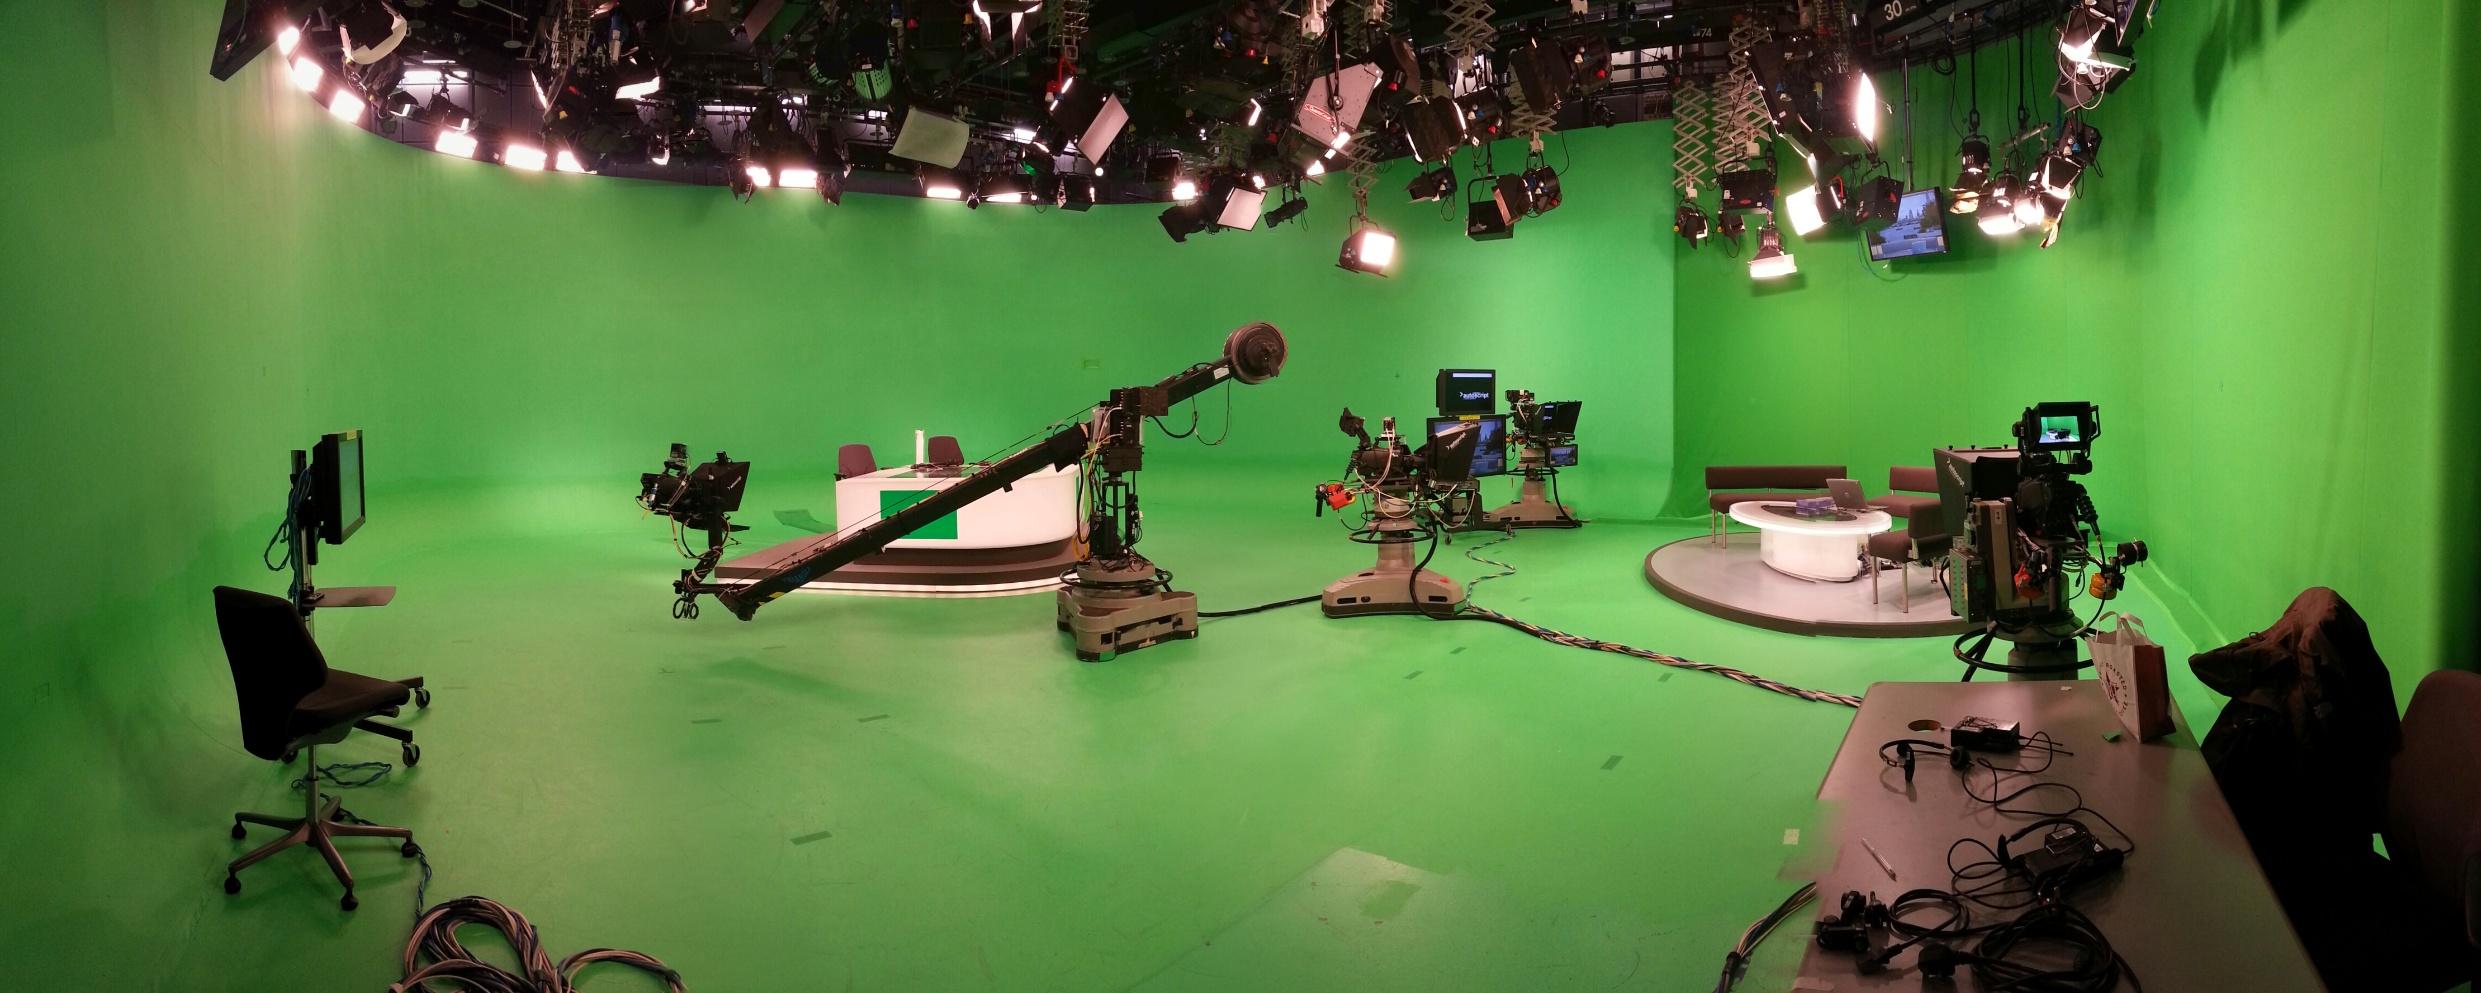 Newsroom Stock Footage  Royalty Free Newsroom Stock